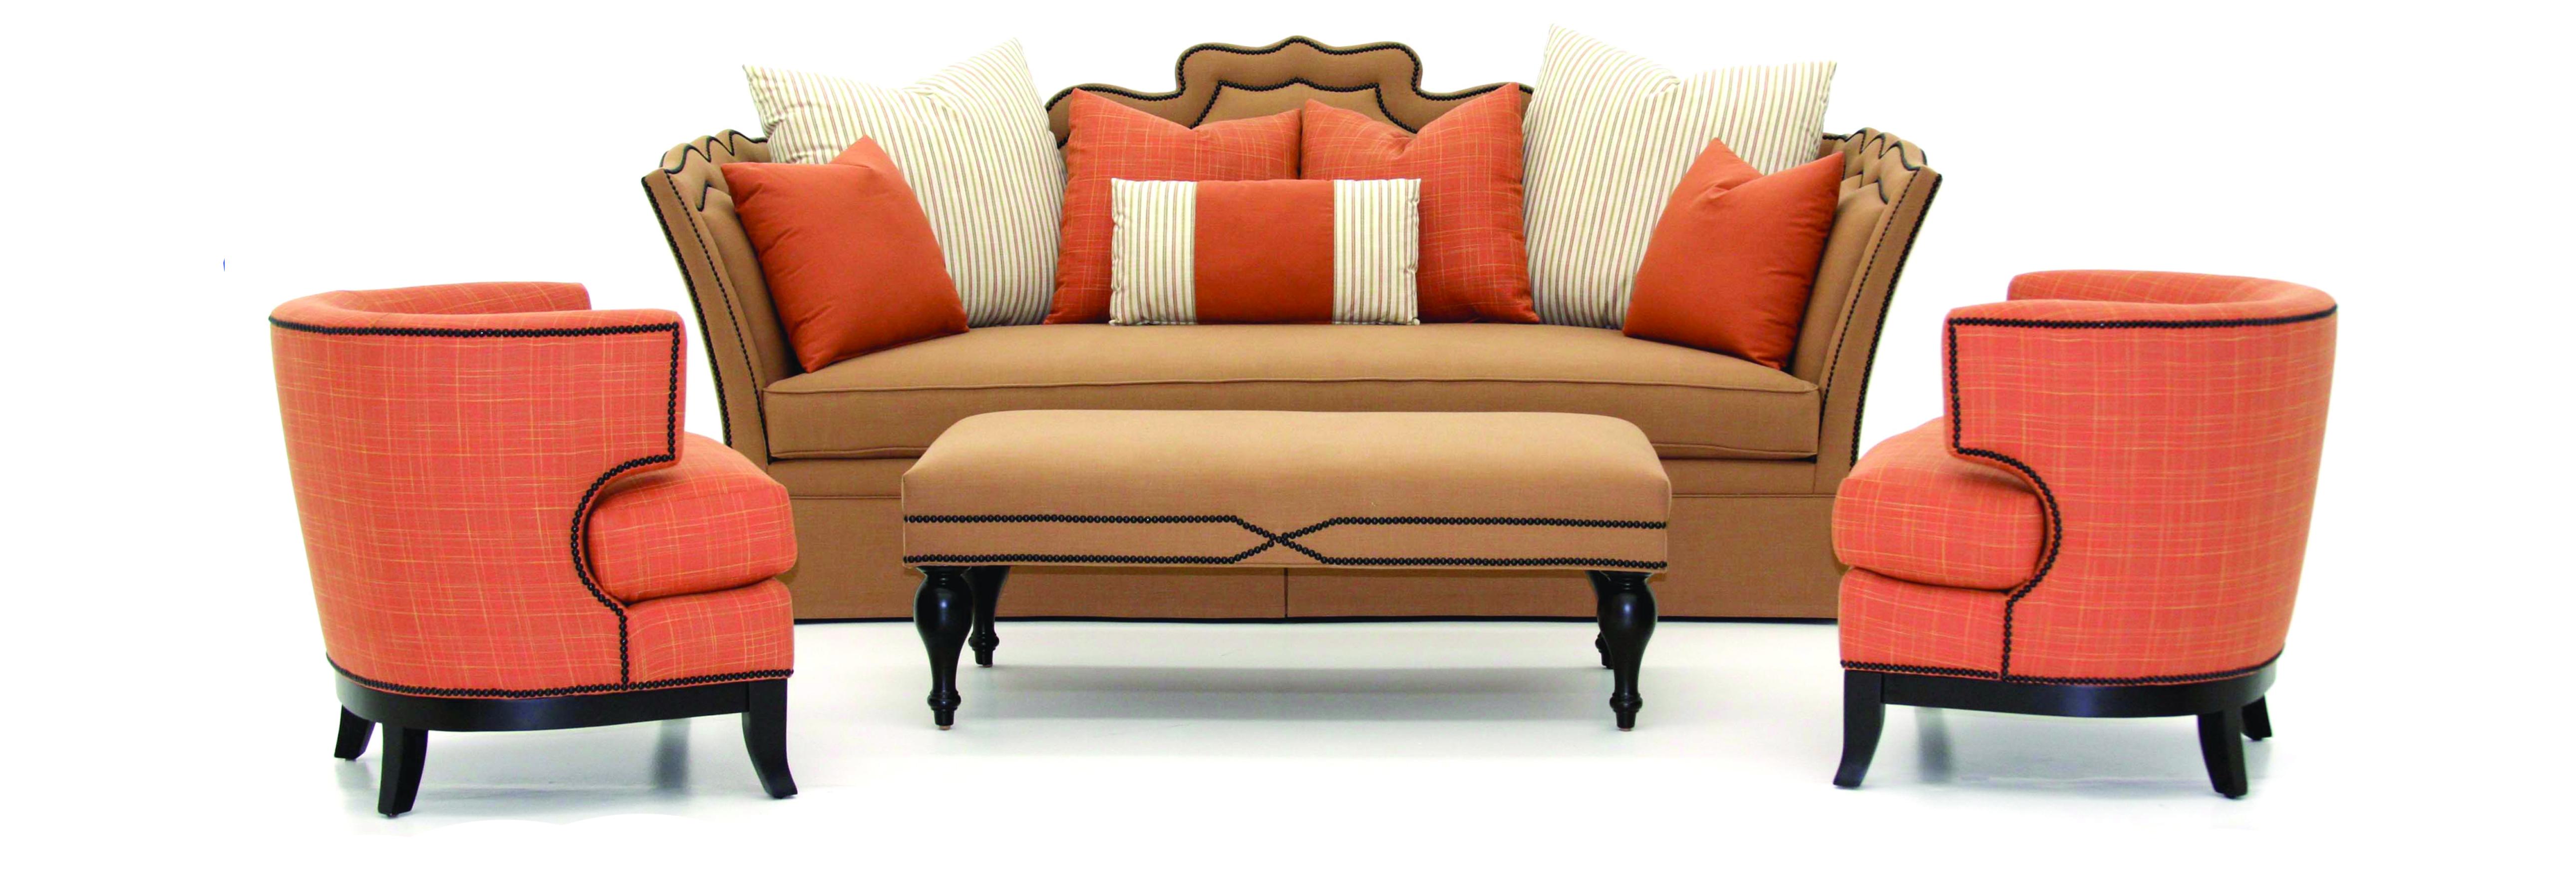 Furniture PNG - 26728